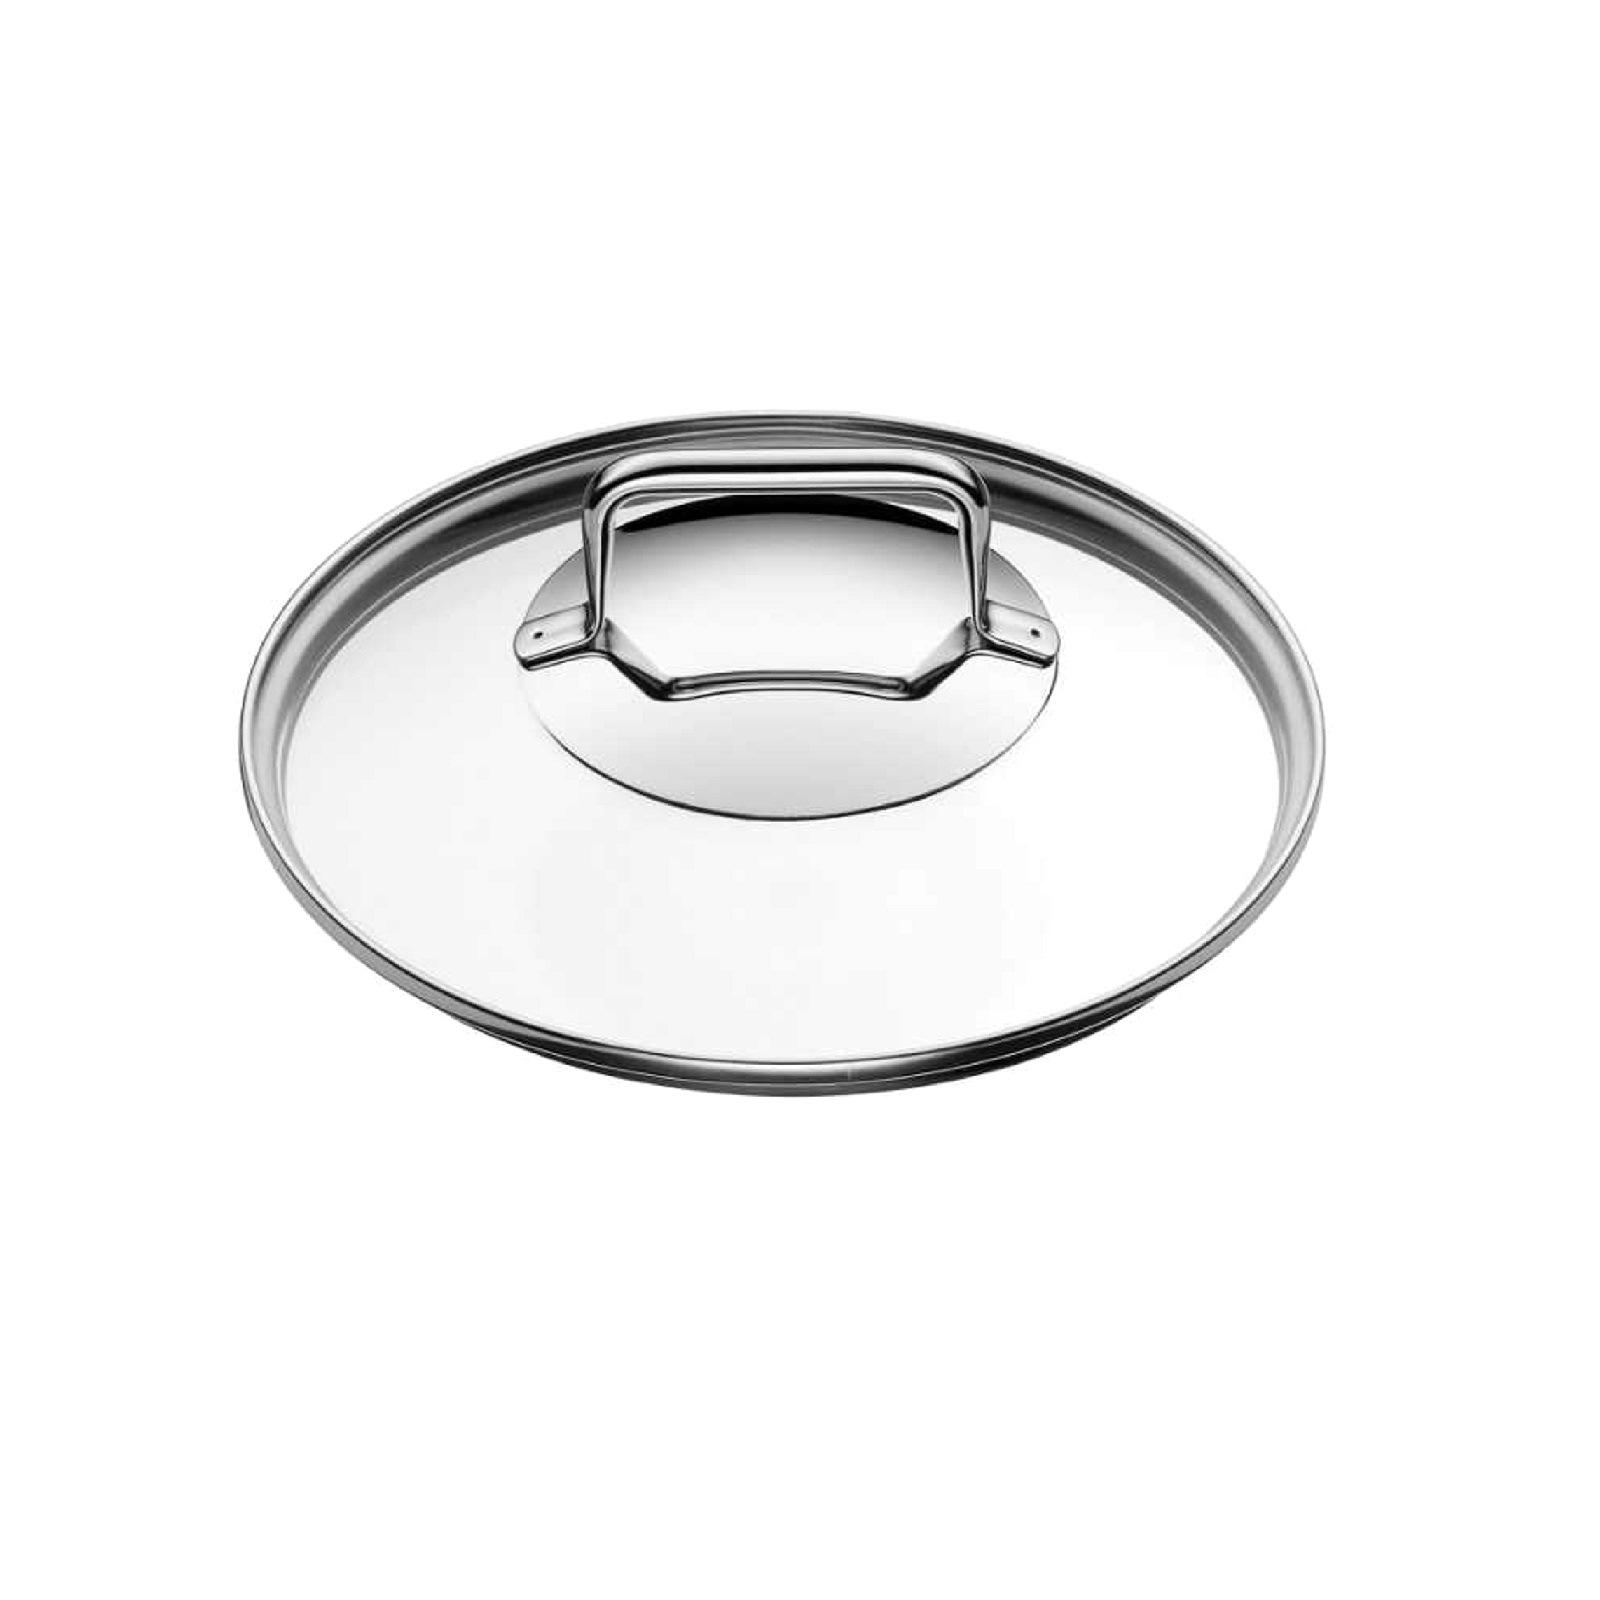 Крышка для кастрюли WMF TREND, диаметр 20 см, прозрачный WMF 07 7220 6382 фото 1